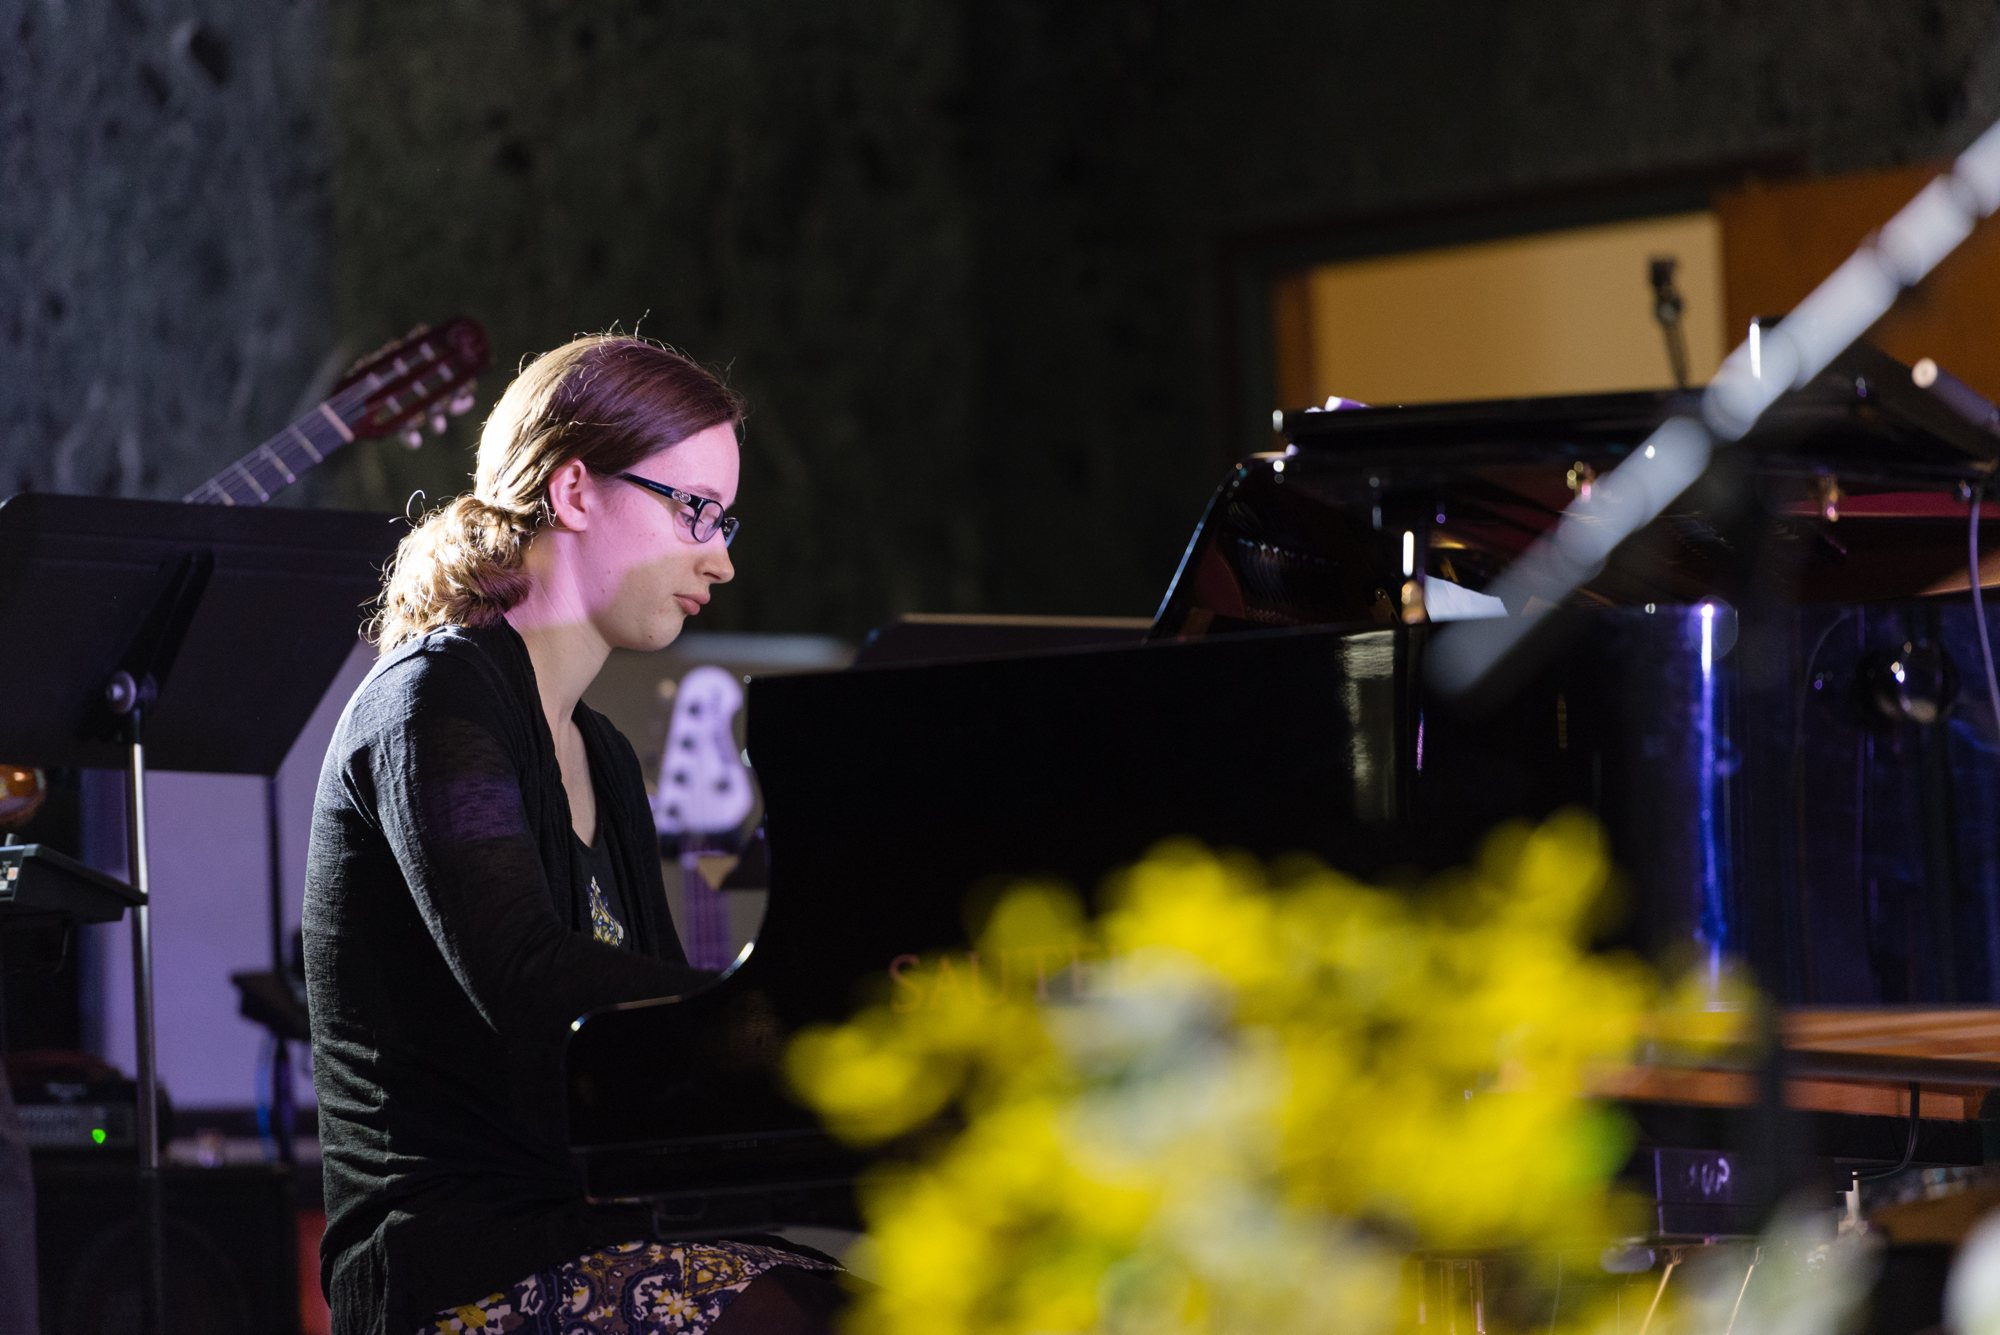 Pianist Emma Clarke